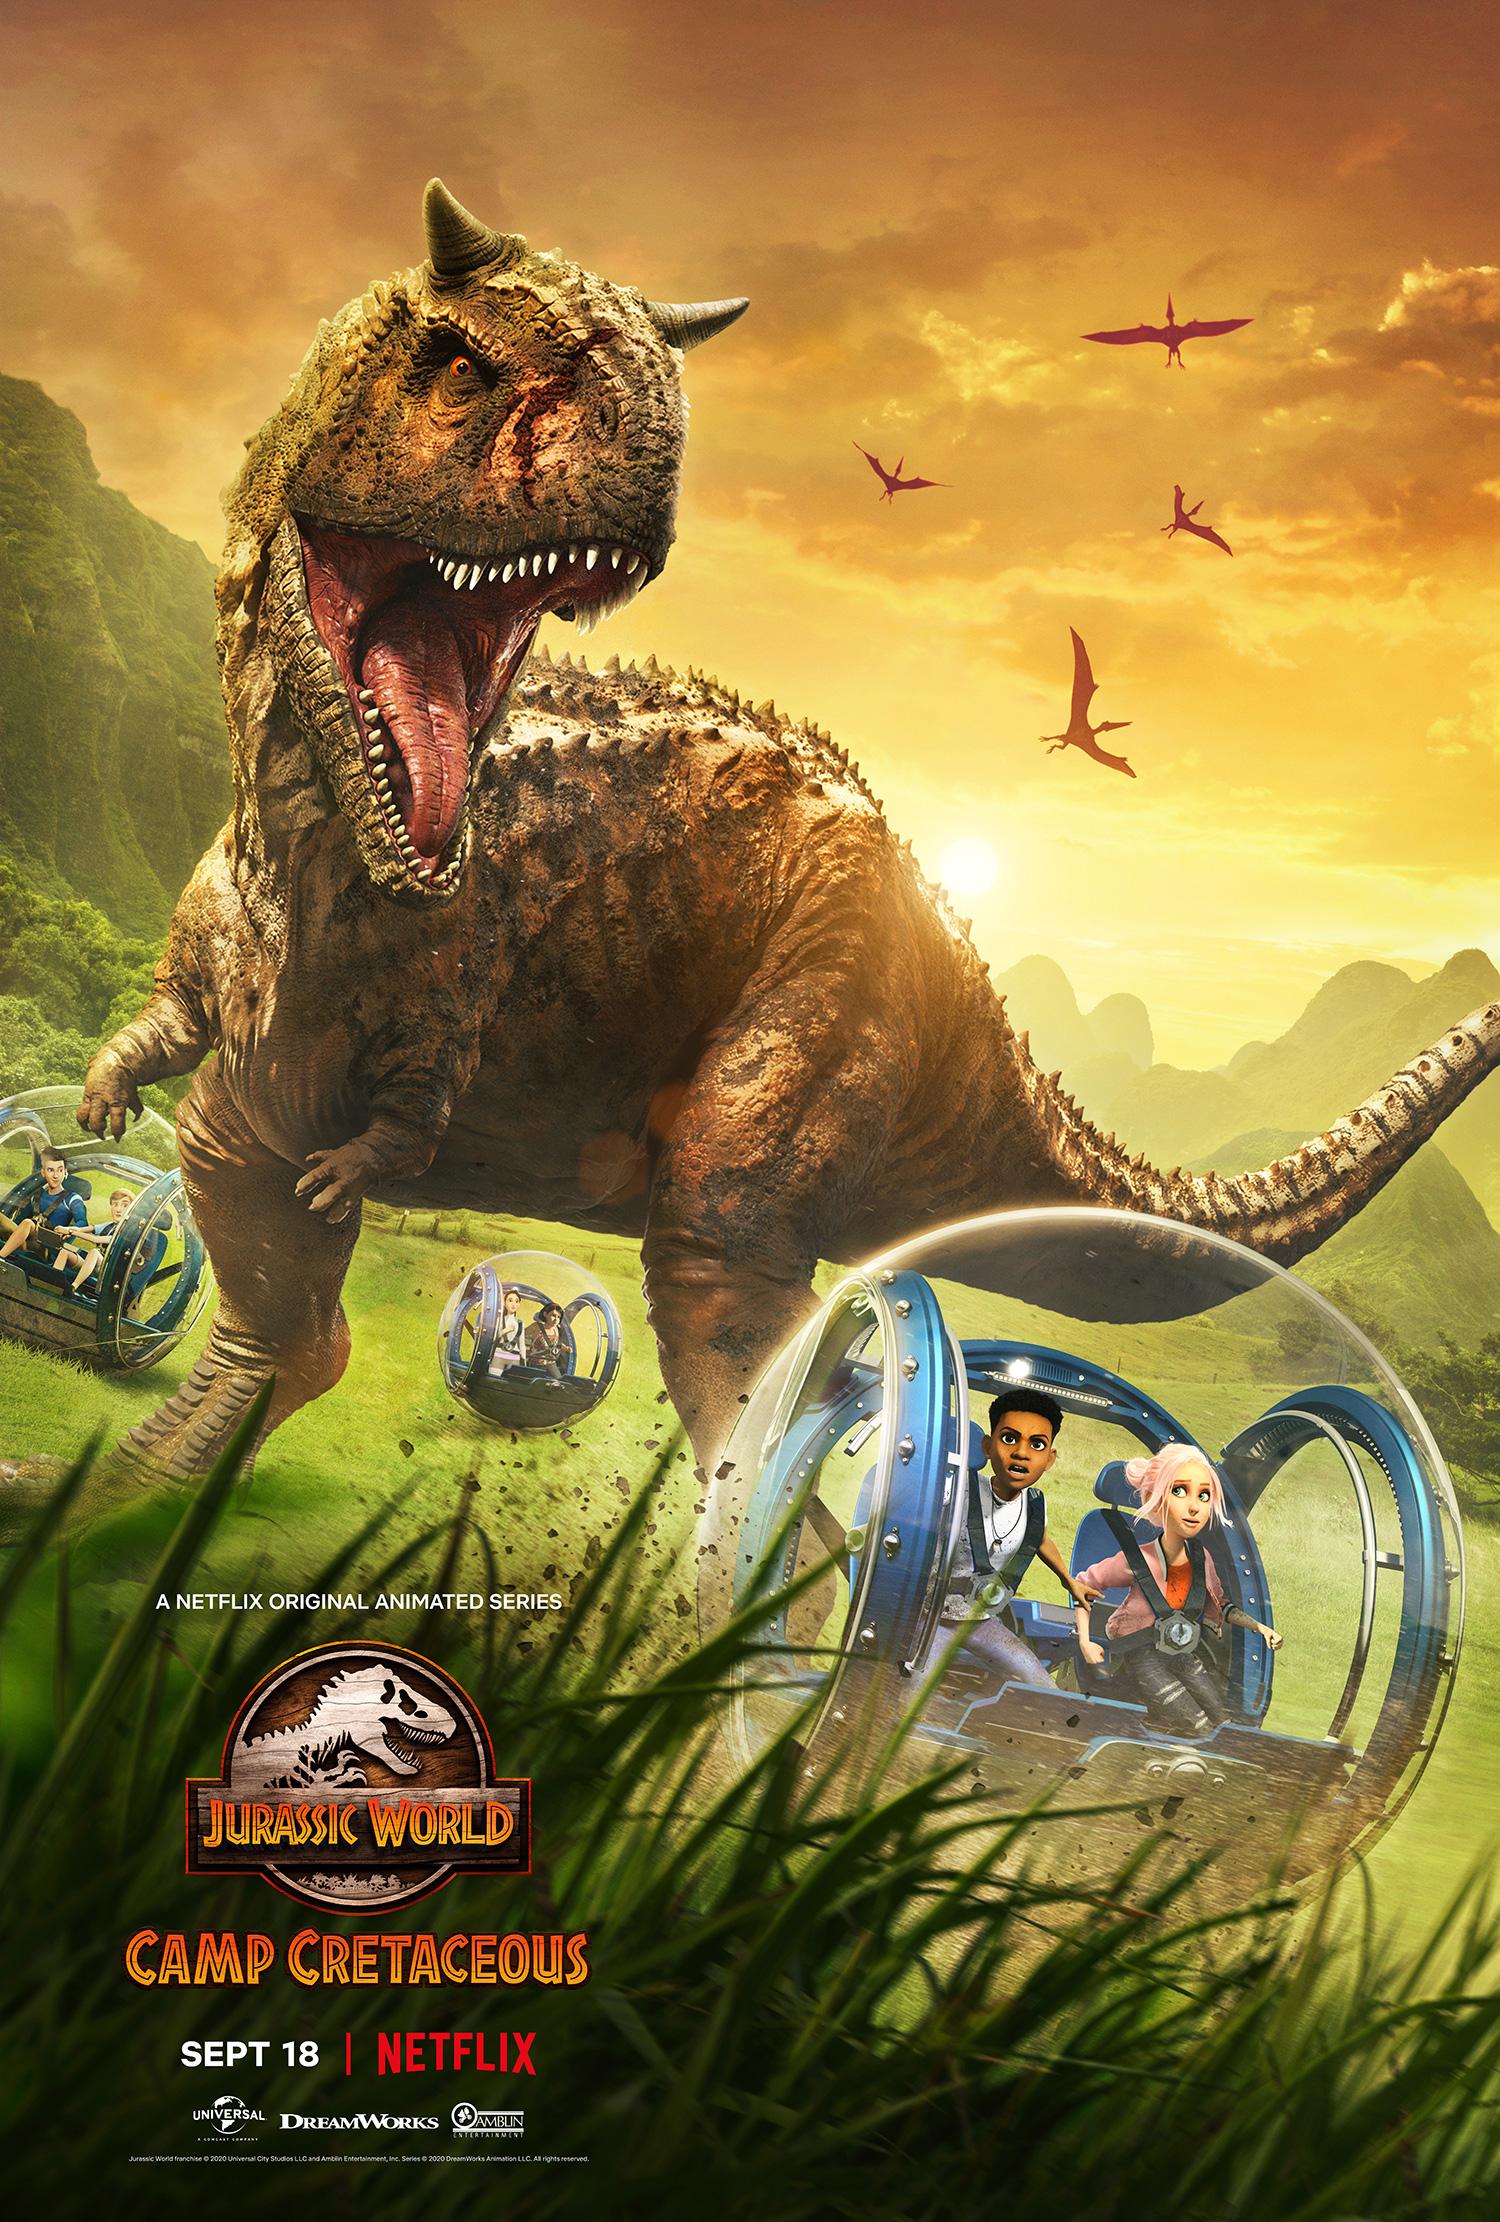 Jurassic World Camp Cretaceous Season 1 จูราสสิค เวิลด์ ค่ายครีเทเชียส ปี1 พากย์ไทย